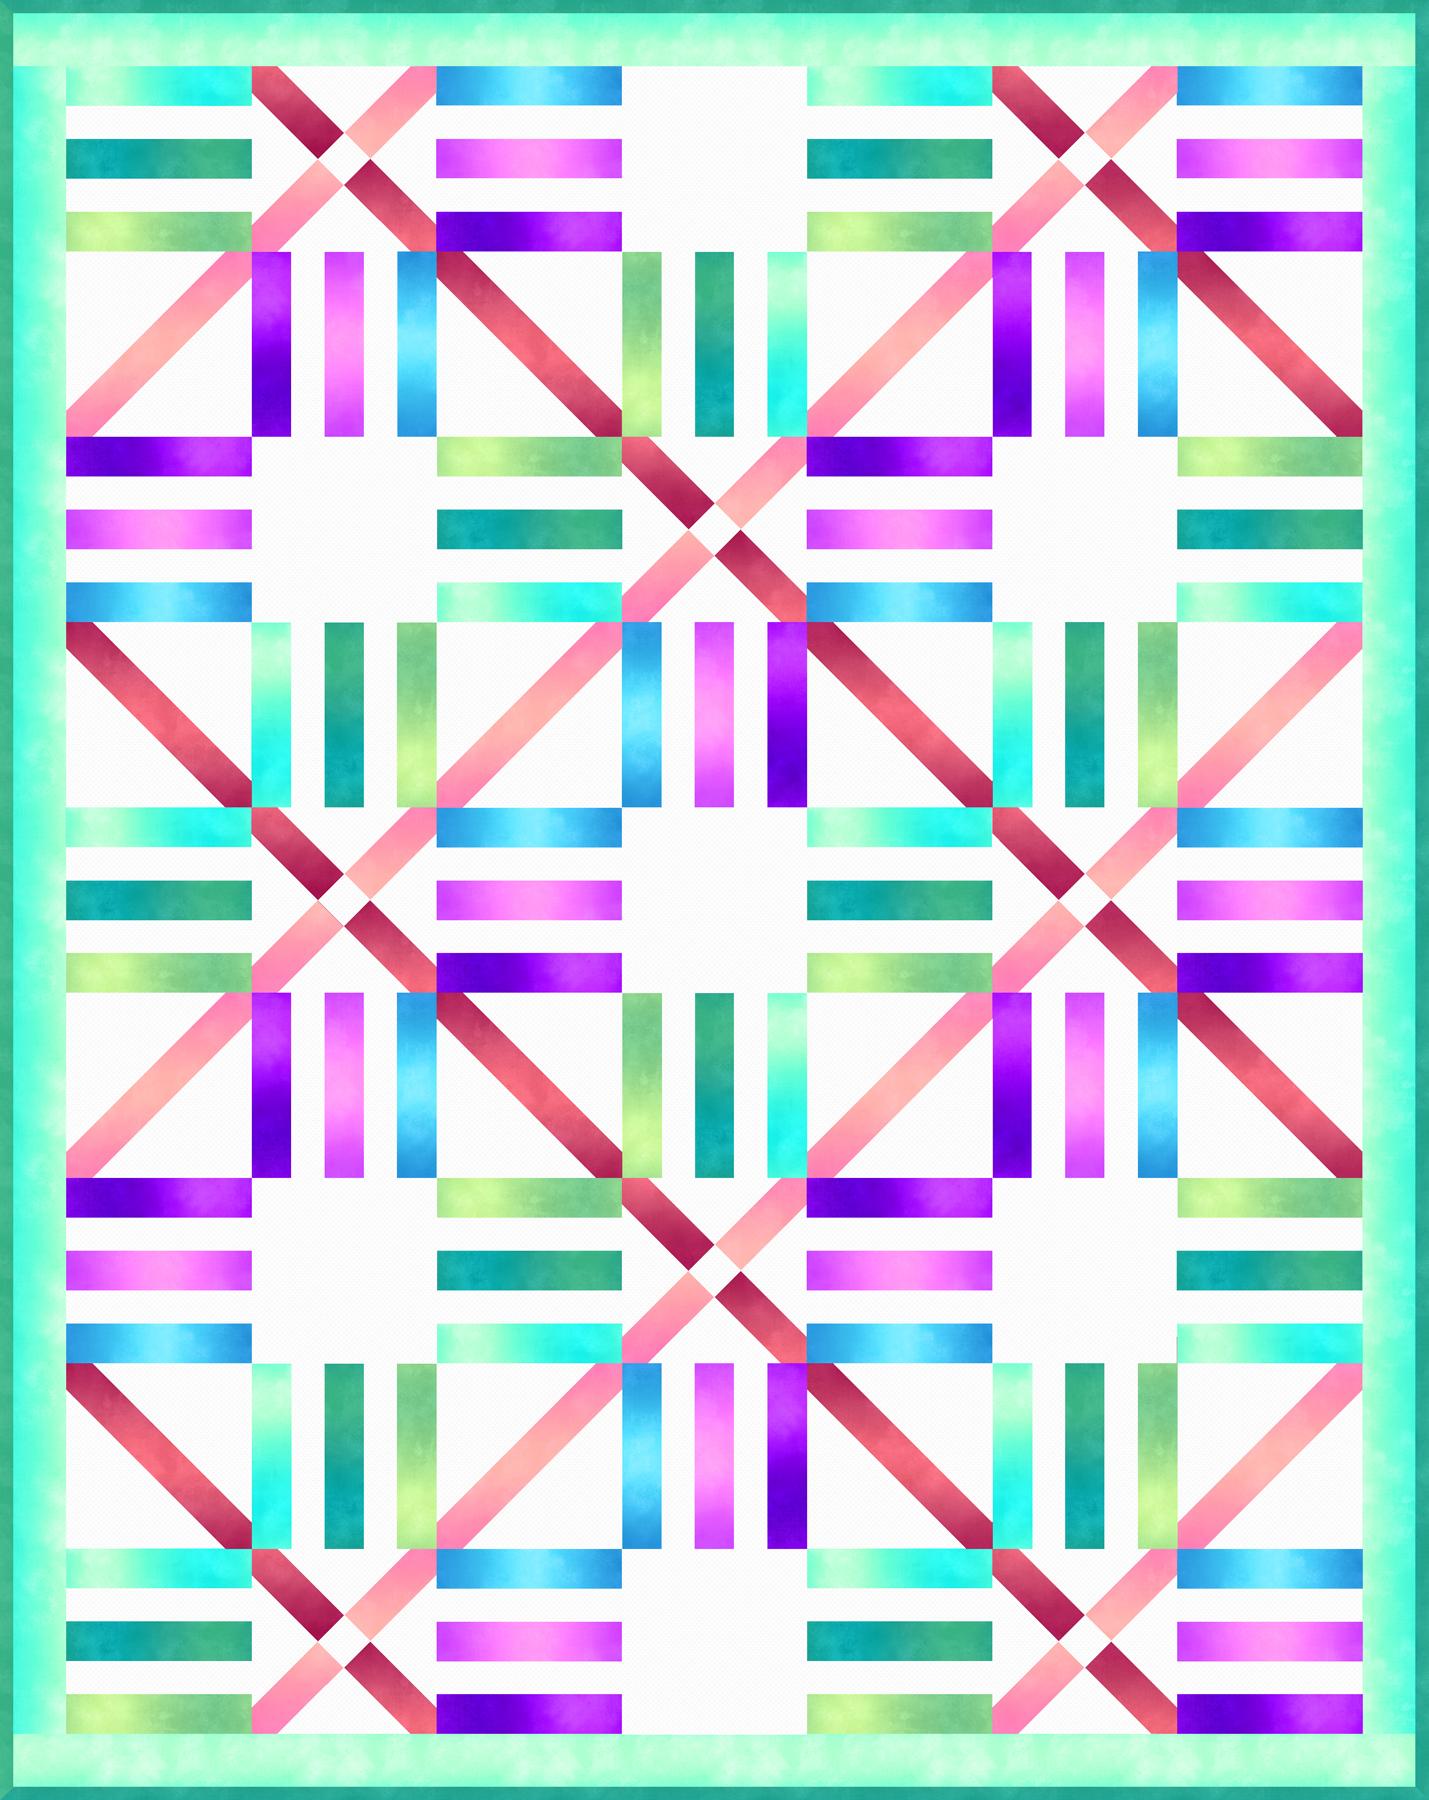 Ombre Parquet Pattern - Cool